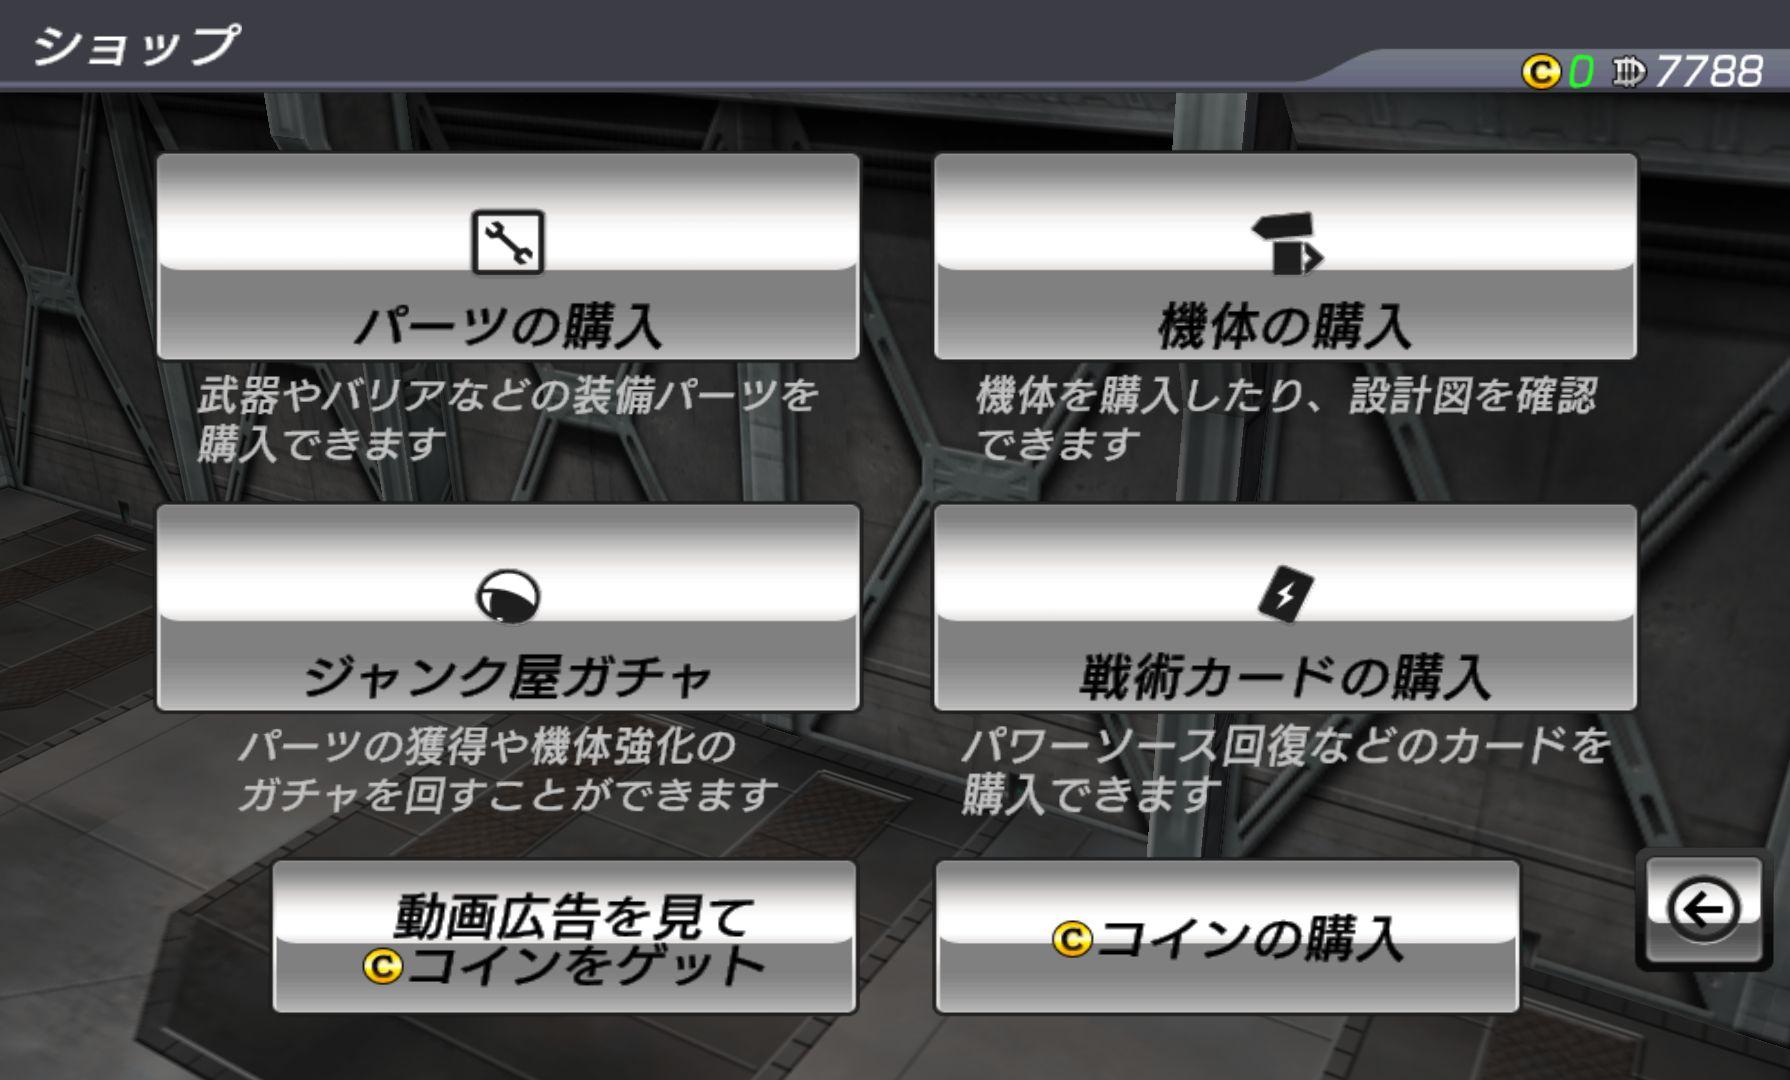 androidアプリ デストロイ・ガンナーズ シグマ(Destroy Gunners Σ)攻略スクリーンショット4